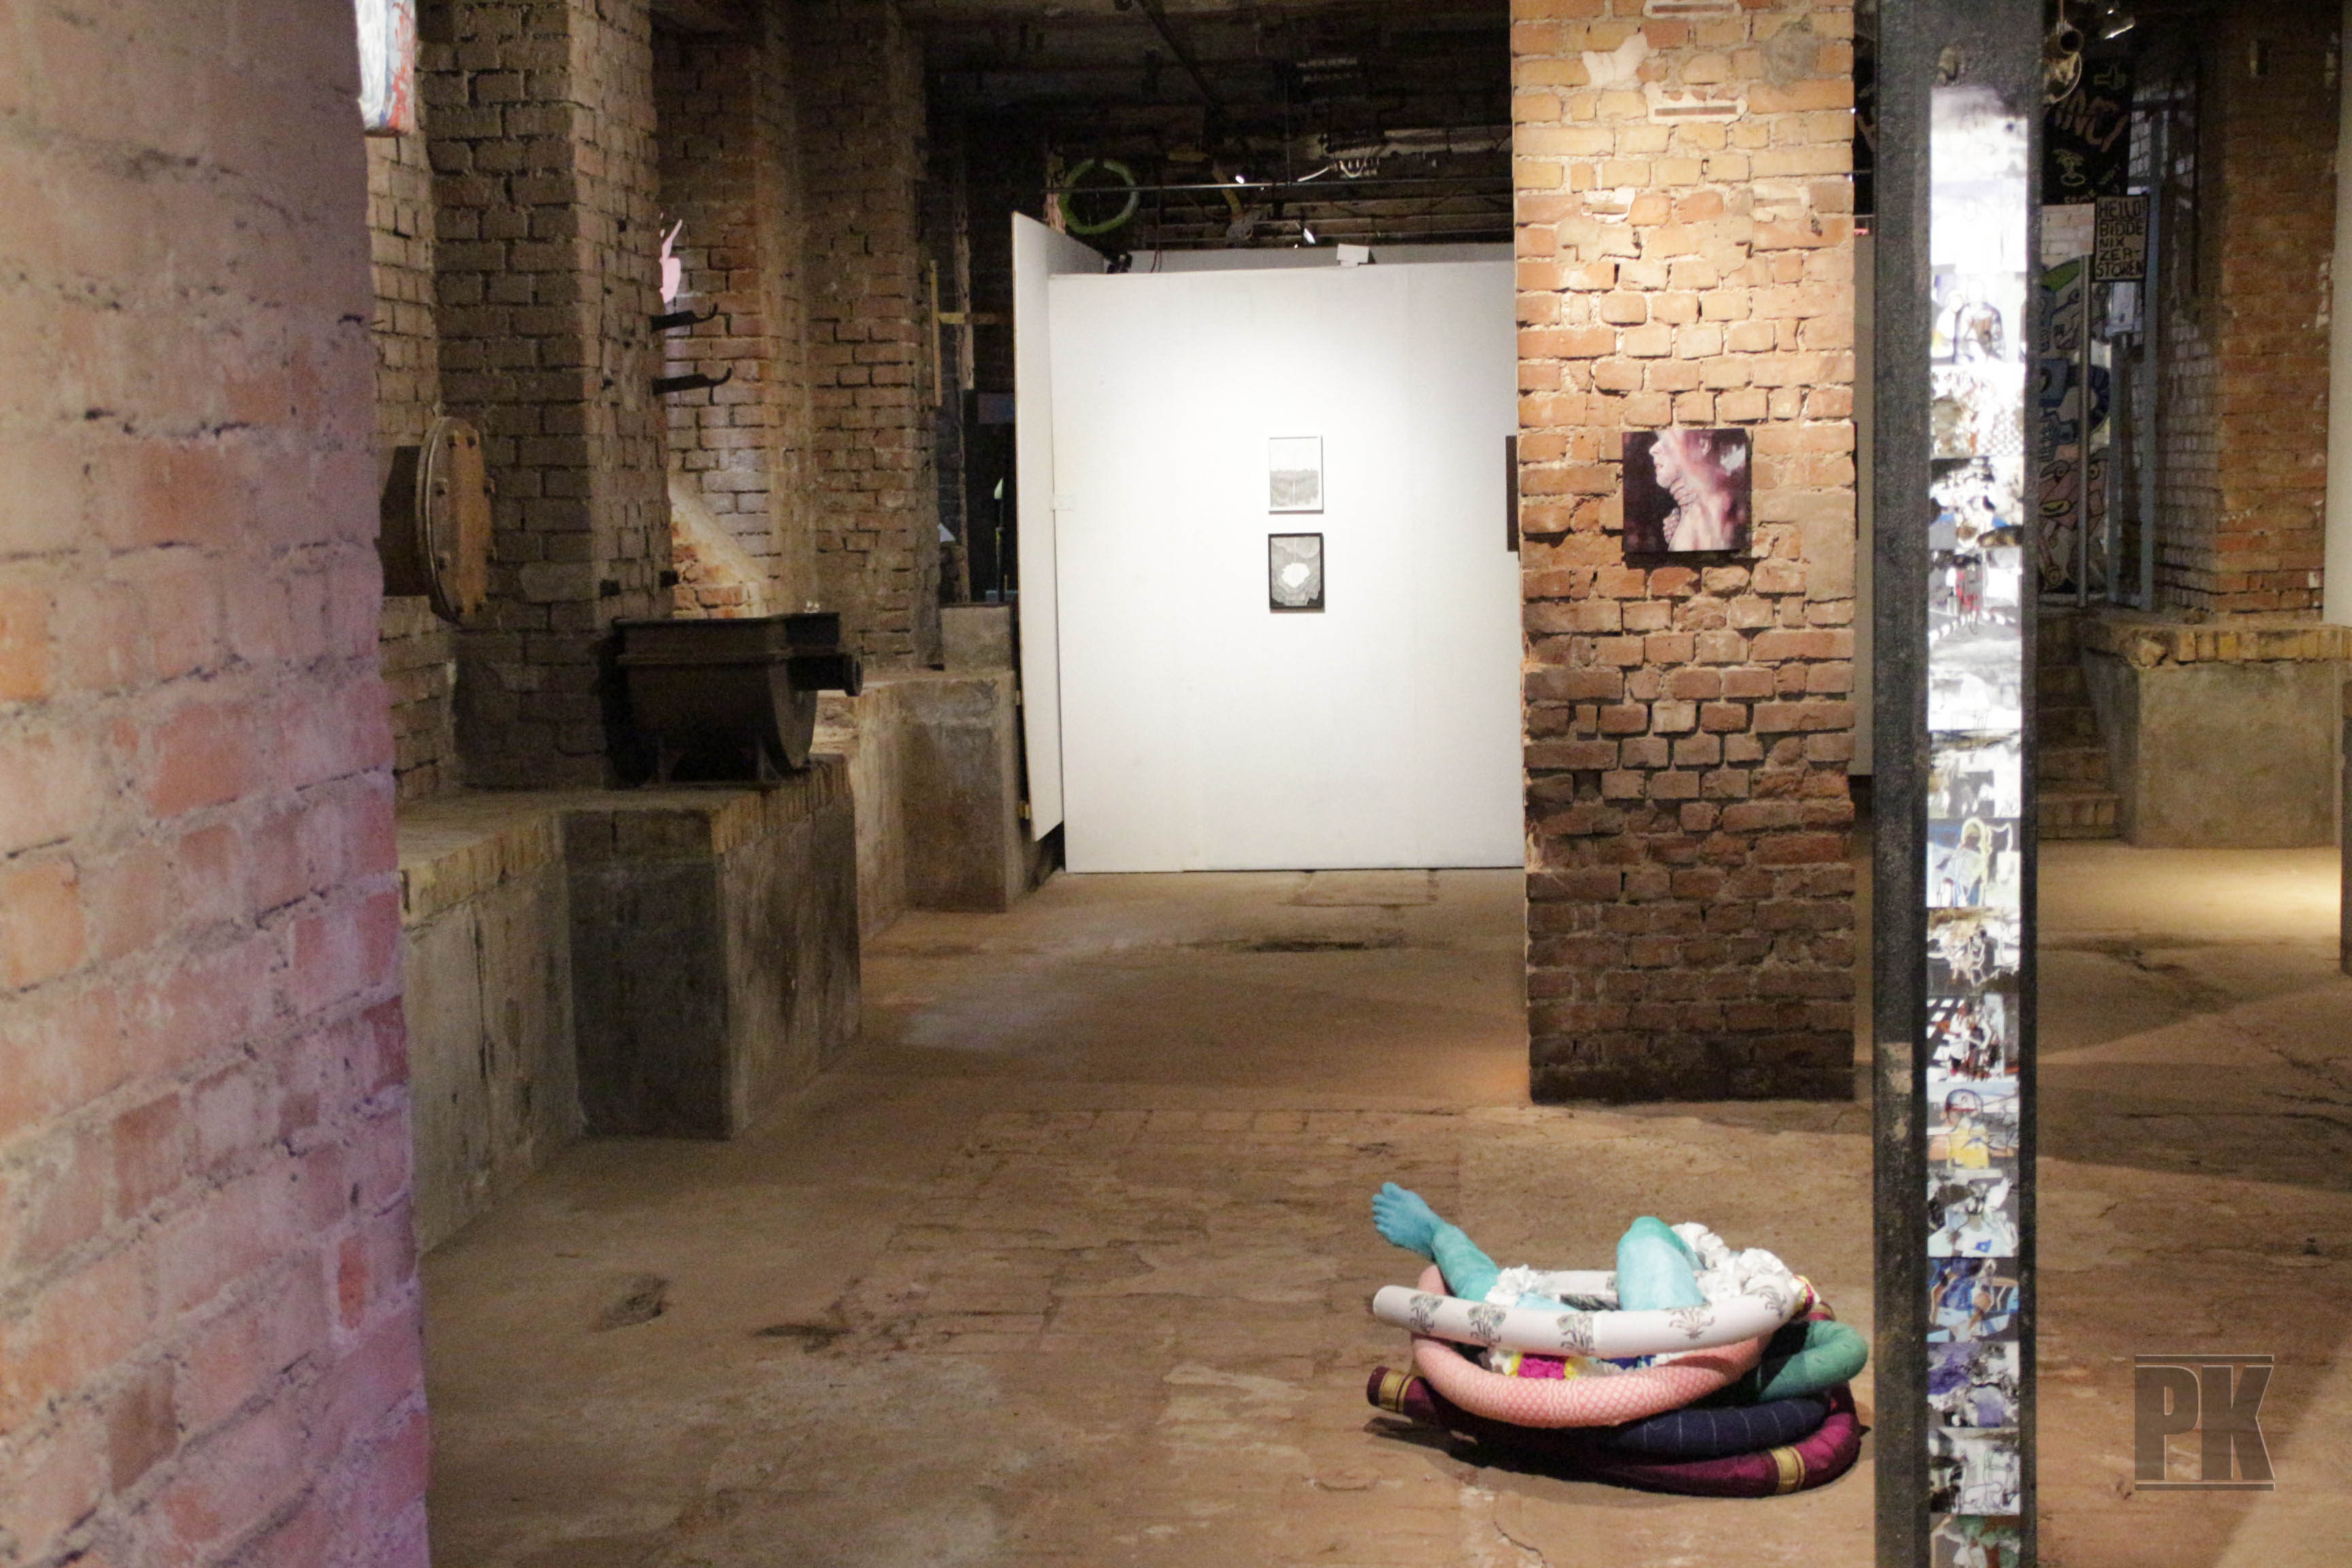 artist-work-Hungry-Dungeon-Friends-installation-view-PILOTENUECHE-International-Art-Program-at-KUNSTKRAFTWERK.-photo-Stanley-Louis-for-PK-47